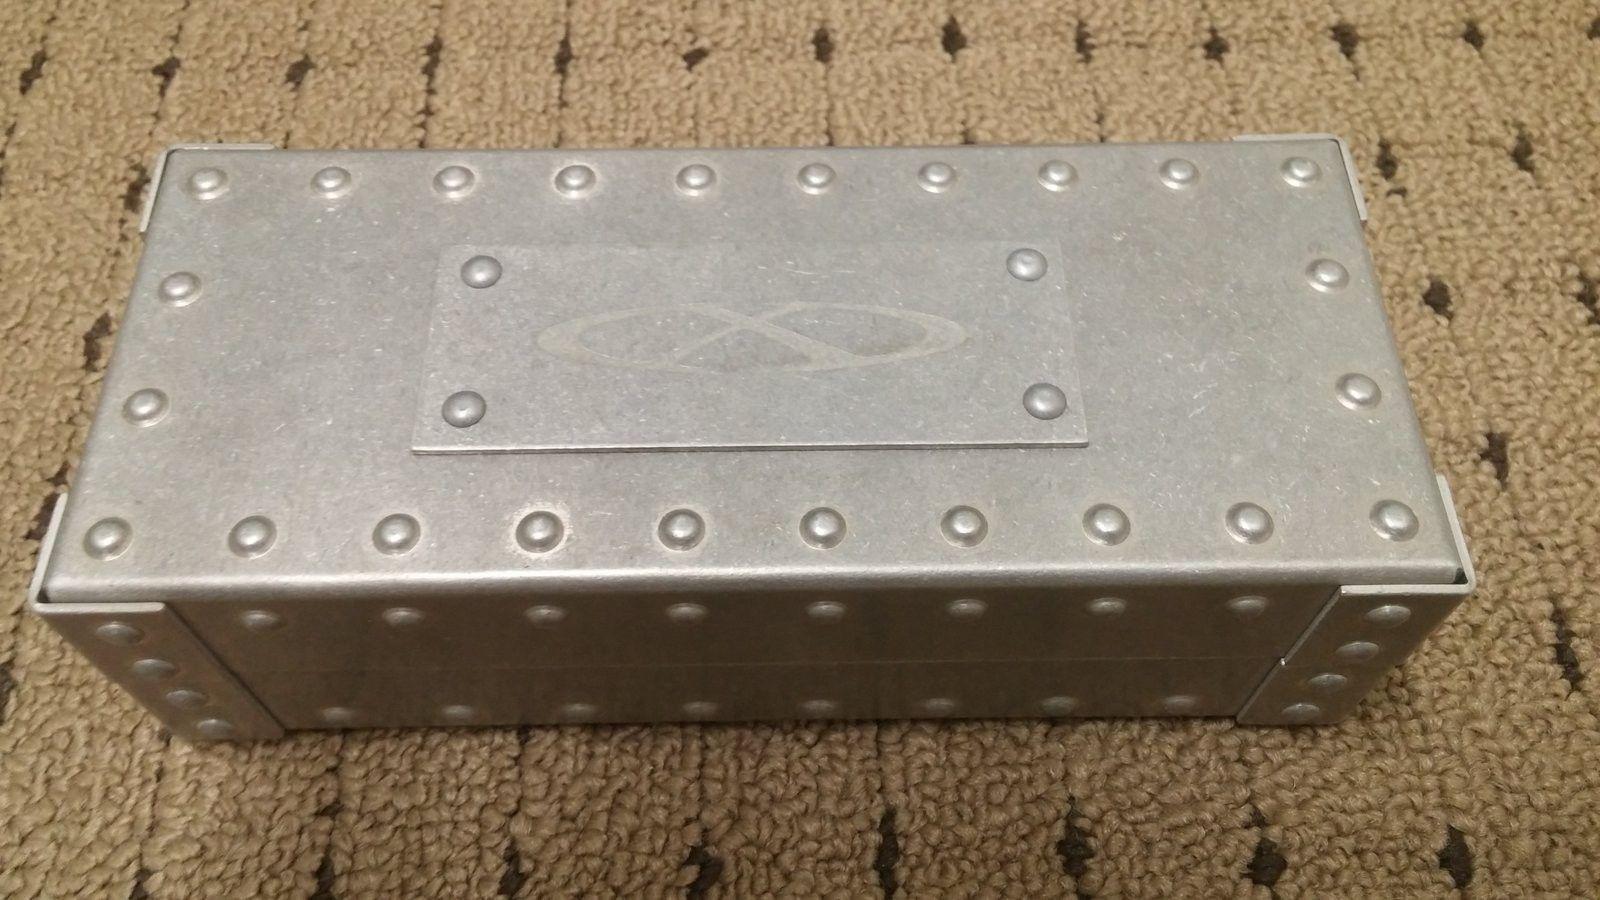 X metal vaults - 1466634057577.jpg